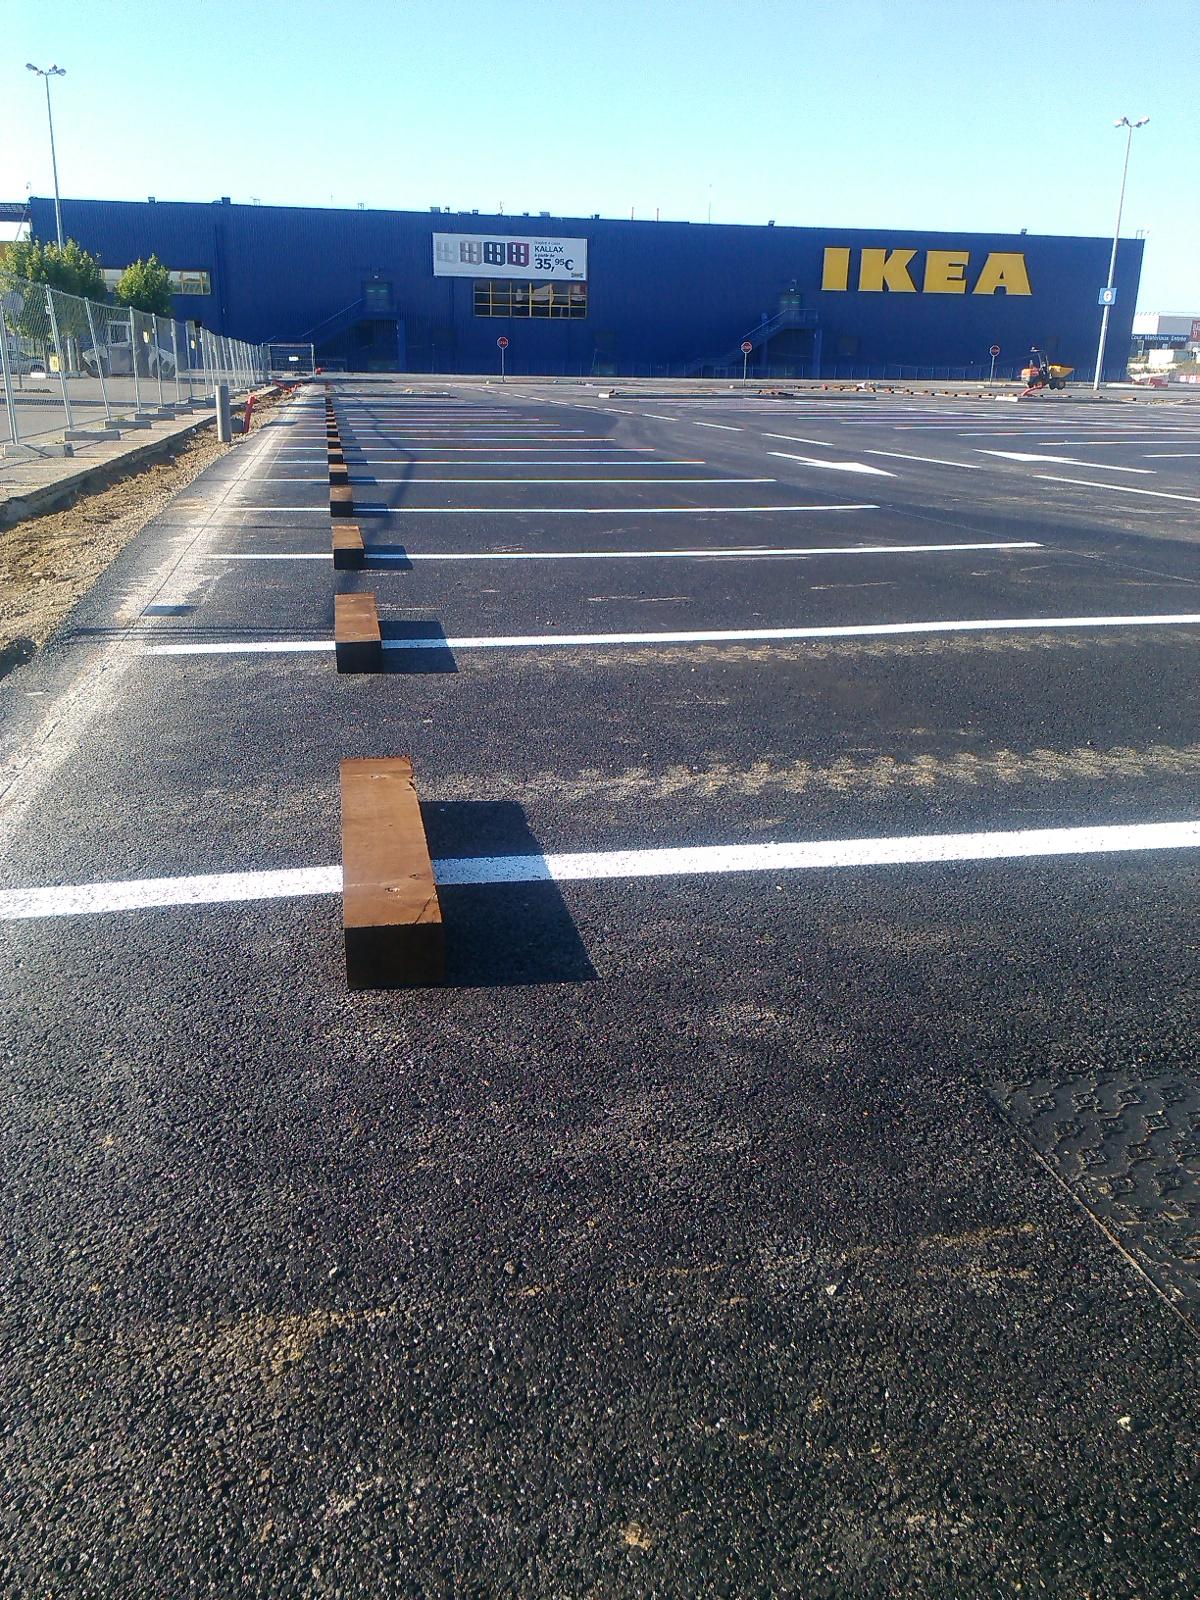 Ikea78 15 06 2